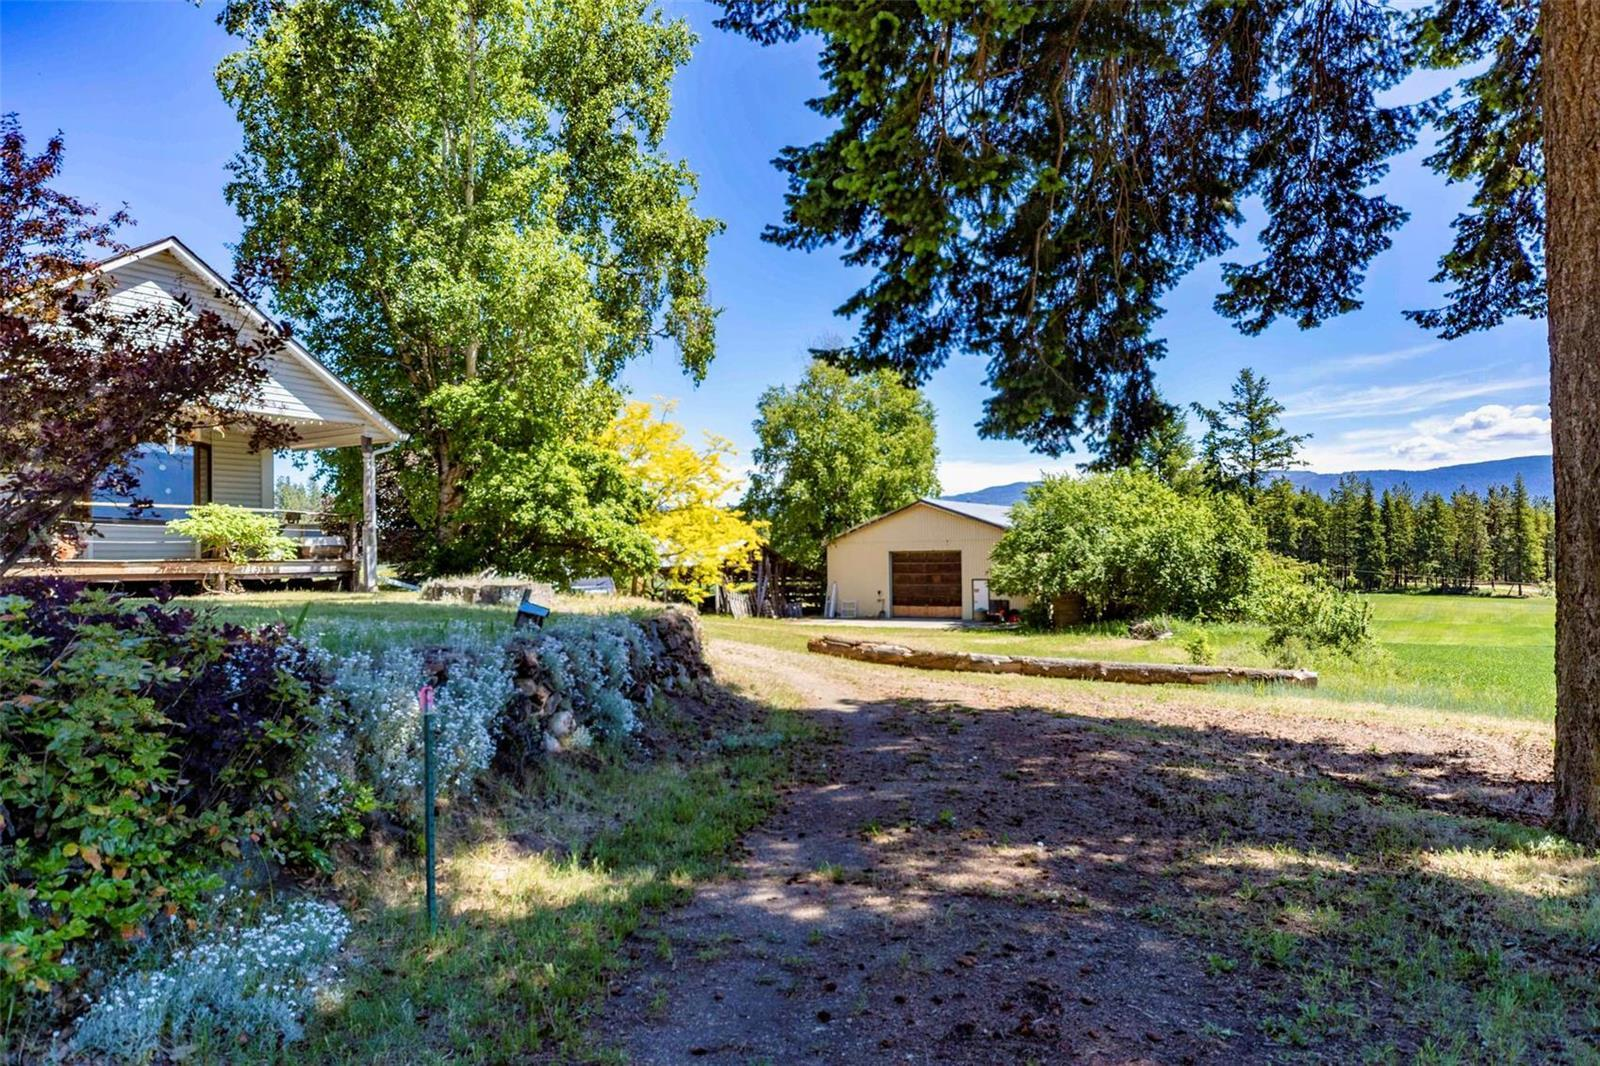 4602 Schubert Road,, Armstrong, British Columbia  V0E 1B4 - Photo 38 - 10232683